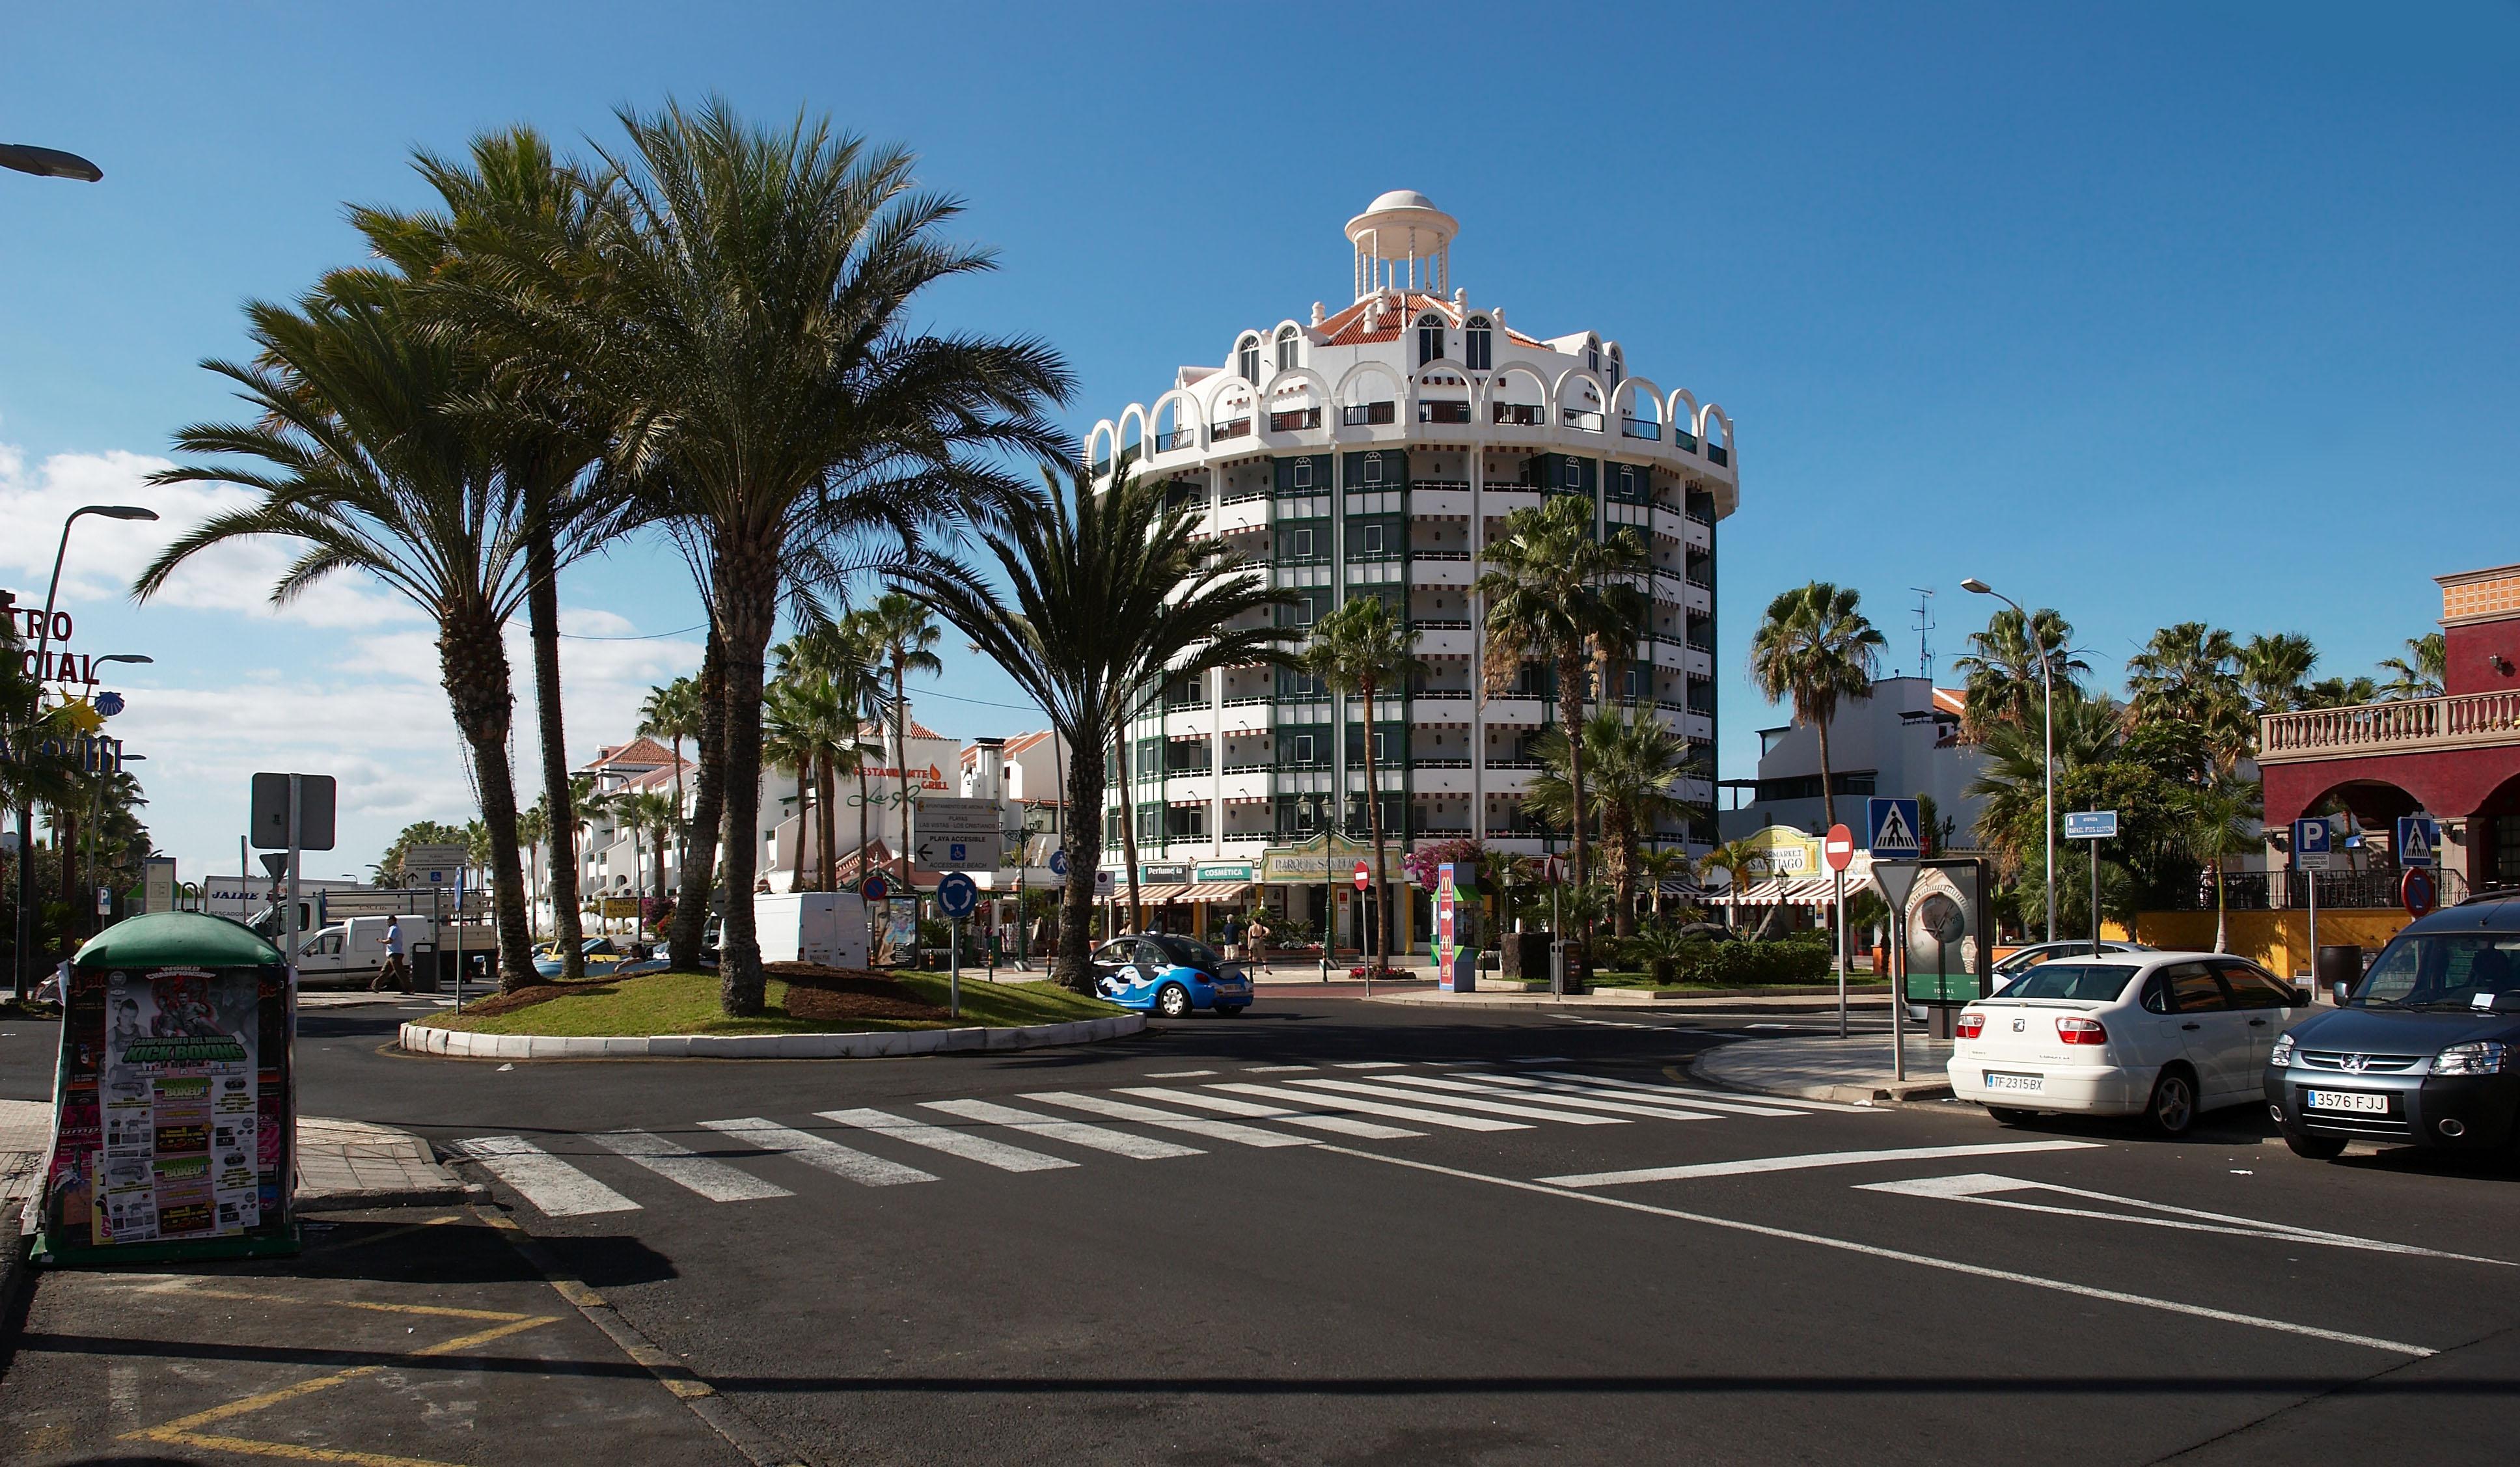 Tigotan Hotel Tenerife Jet